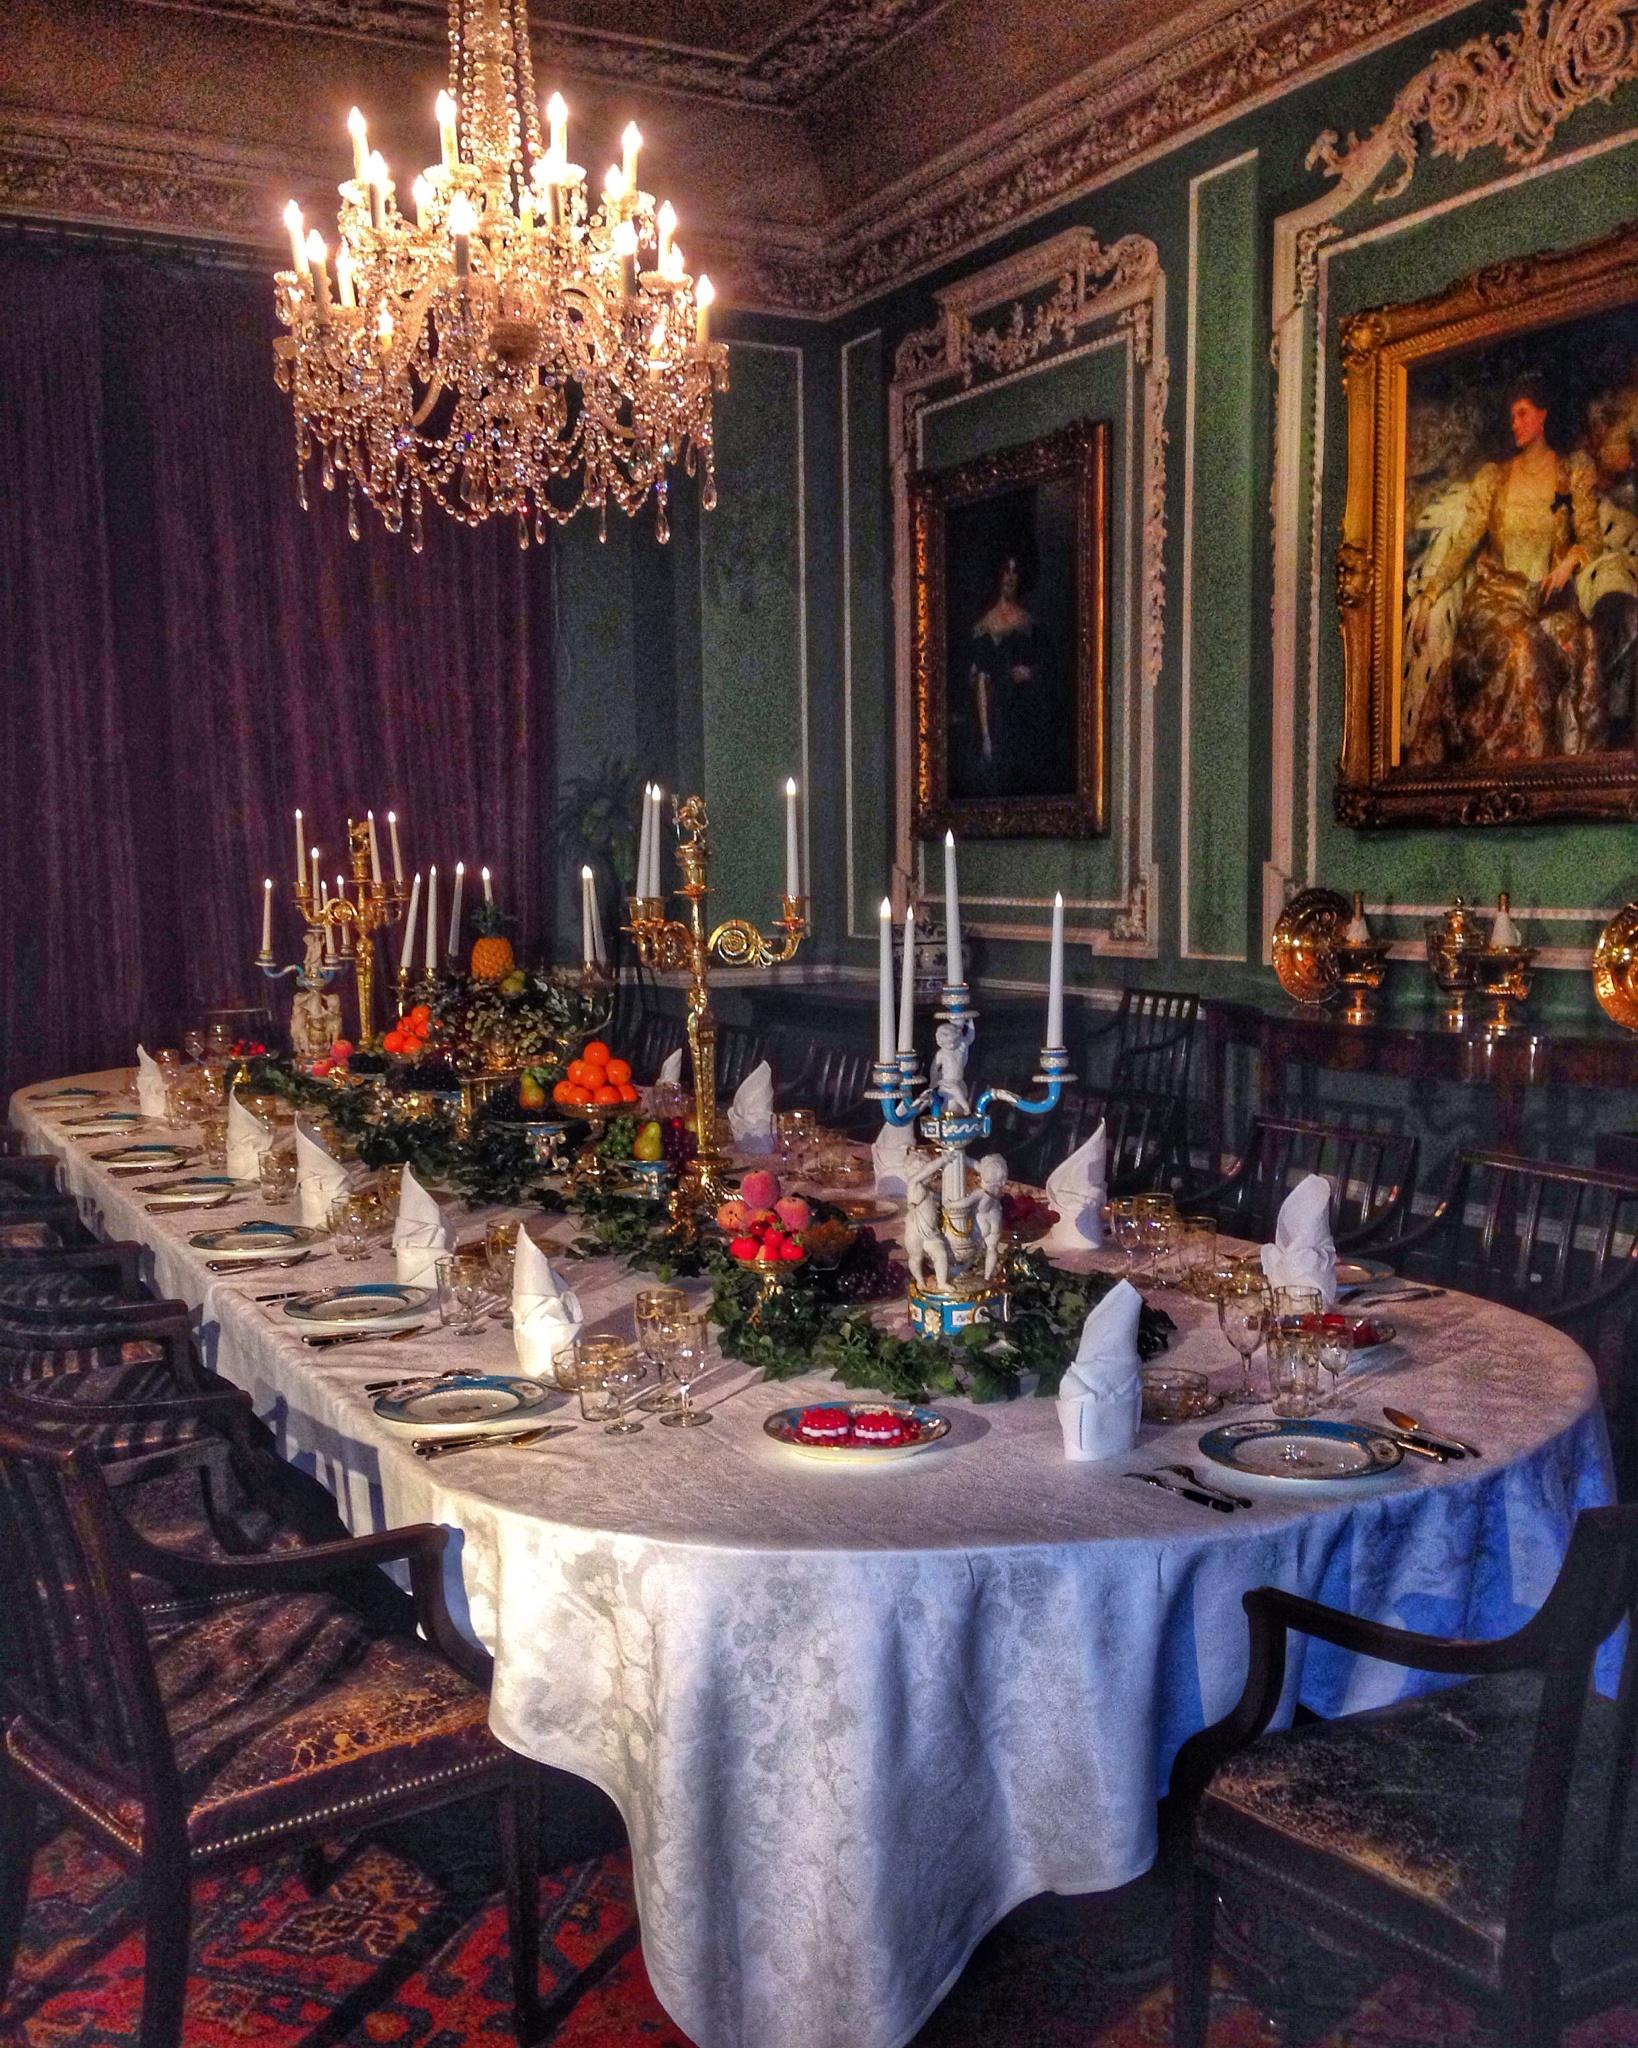 Fine dining  by VicsPics